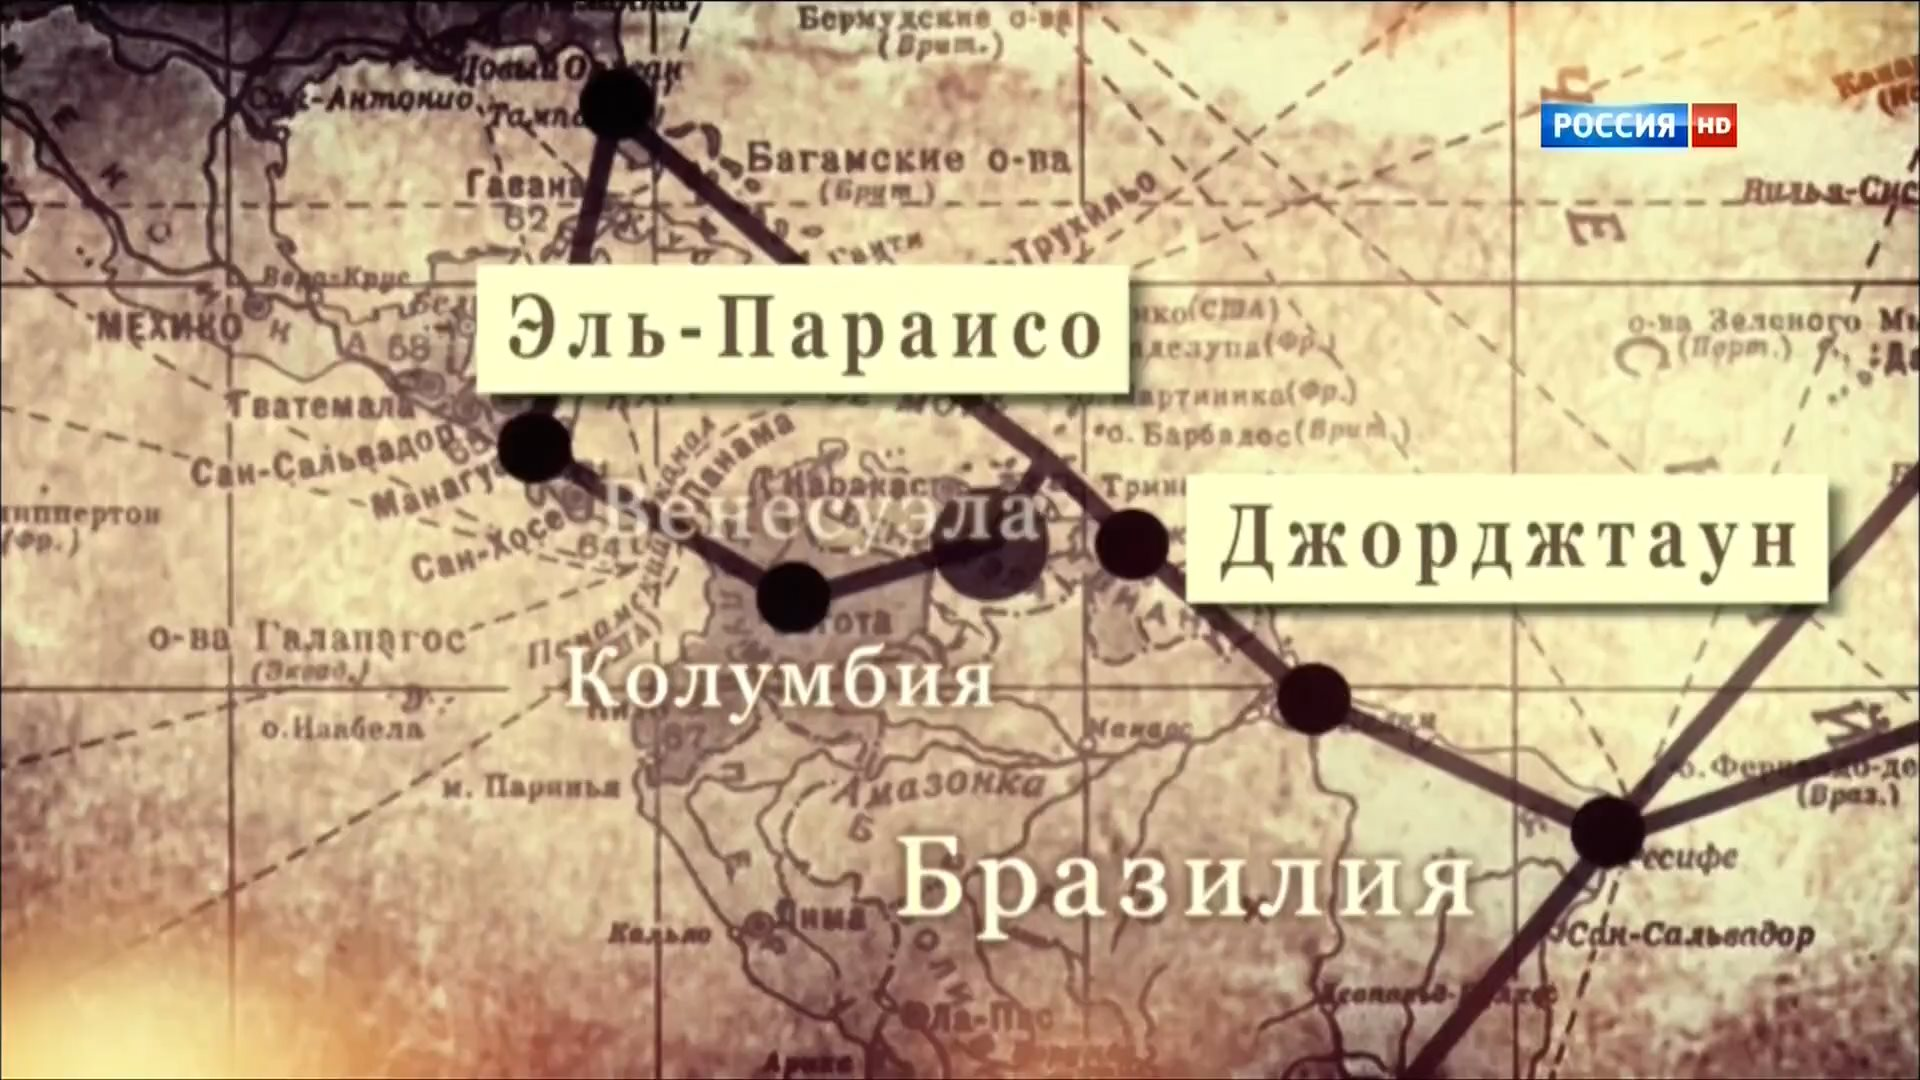 http://i4.imageban.ru/out/2014/04/15/3ca0df58b33ad34811e999eb5b5abcb9.jpg